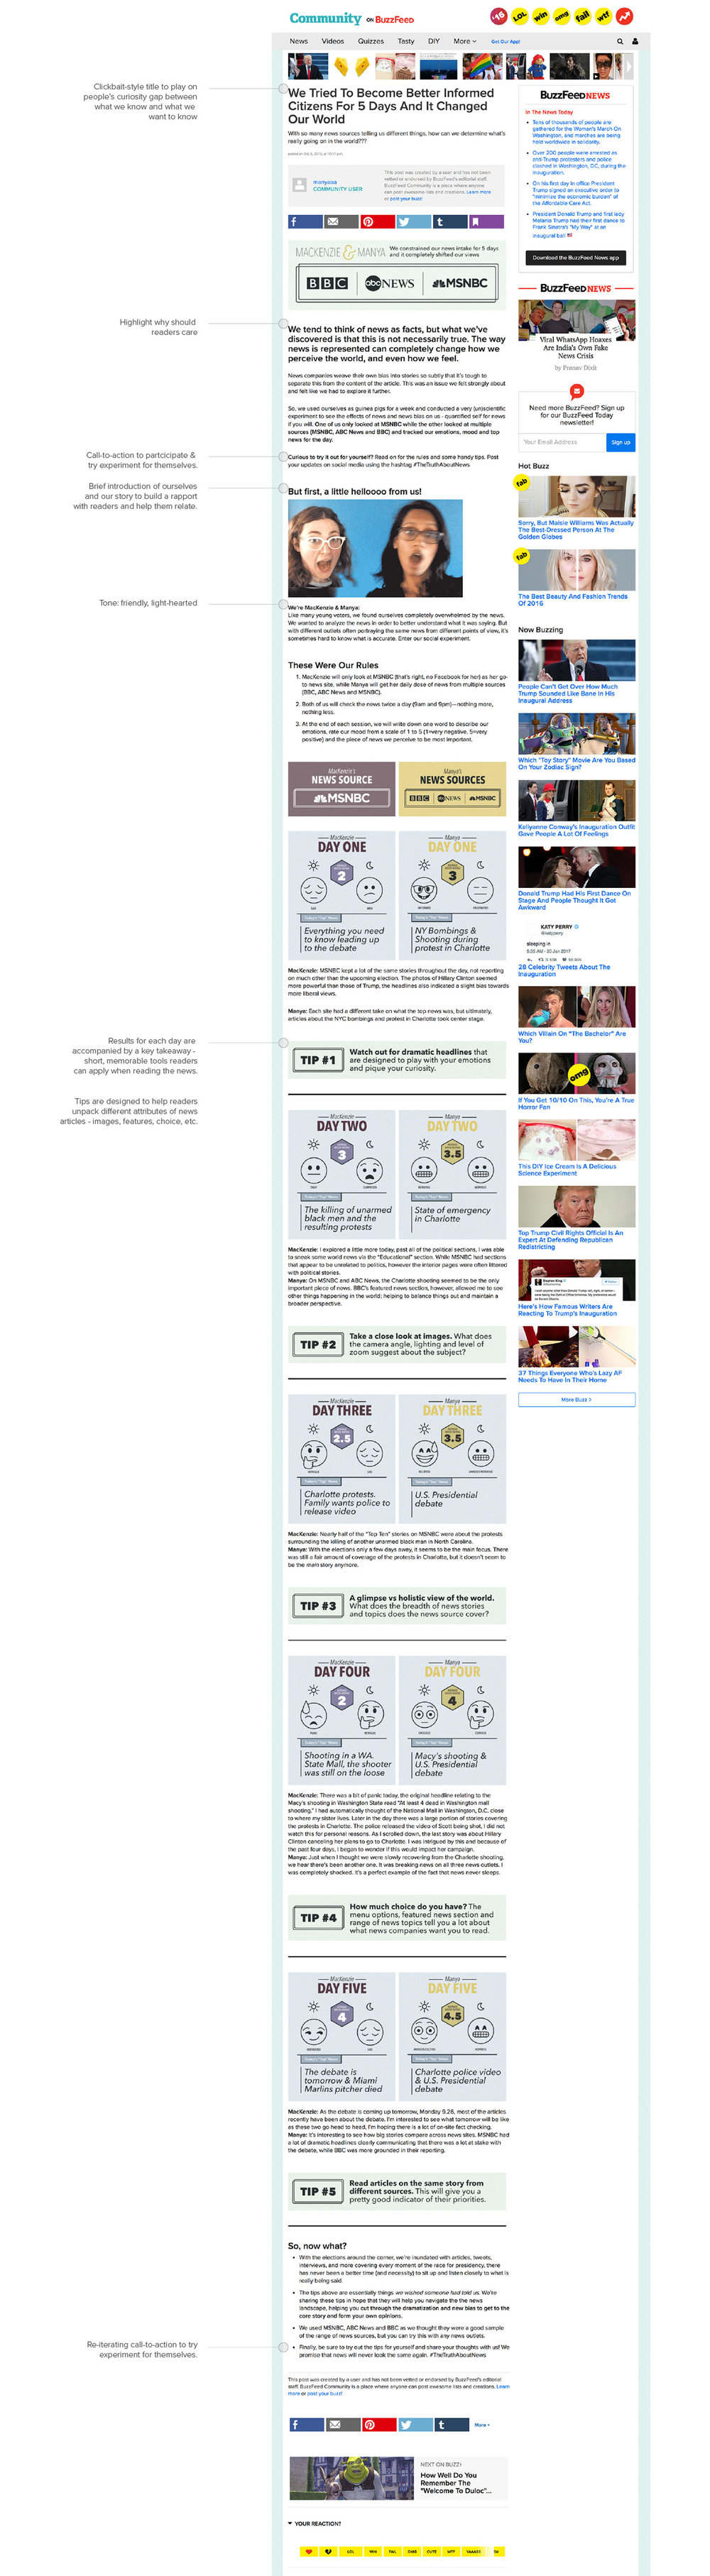 Final buzzfeed article screenshot_annotated.jpg